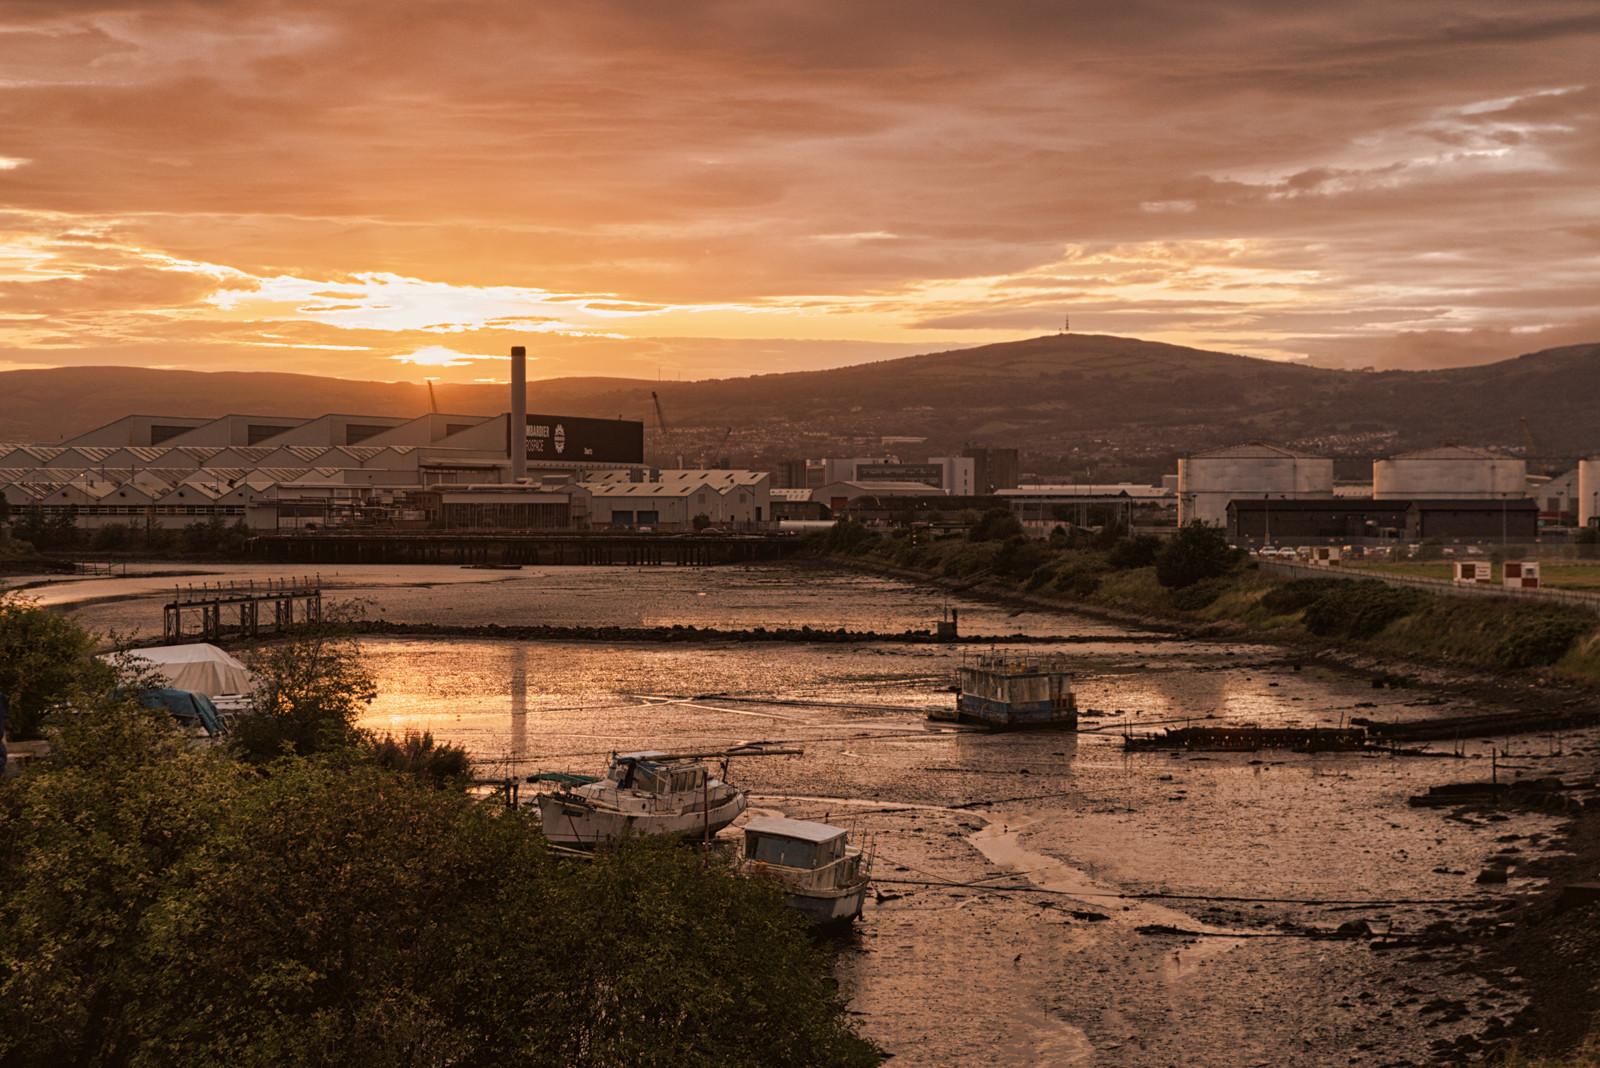 PDI - Connswater Sunset by Jonny Clark (8 marks)